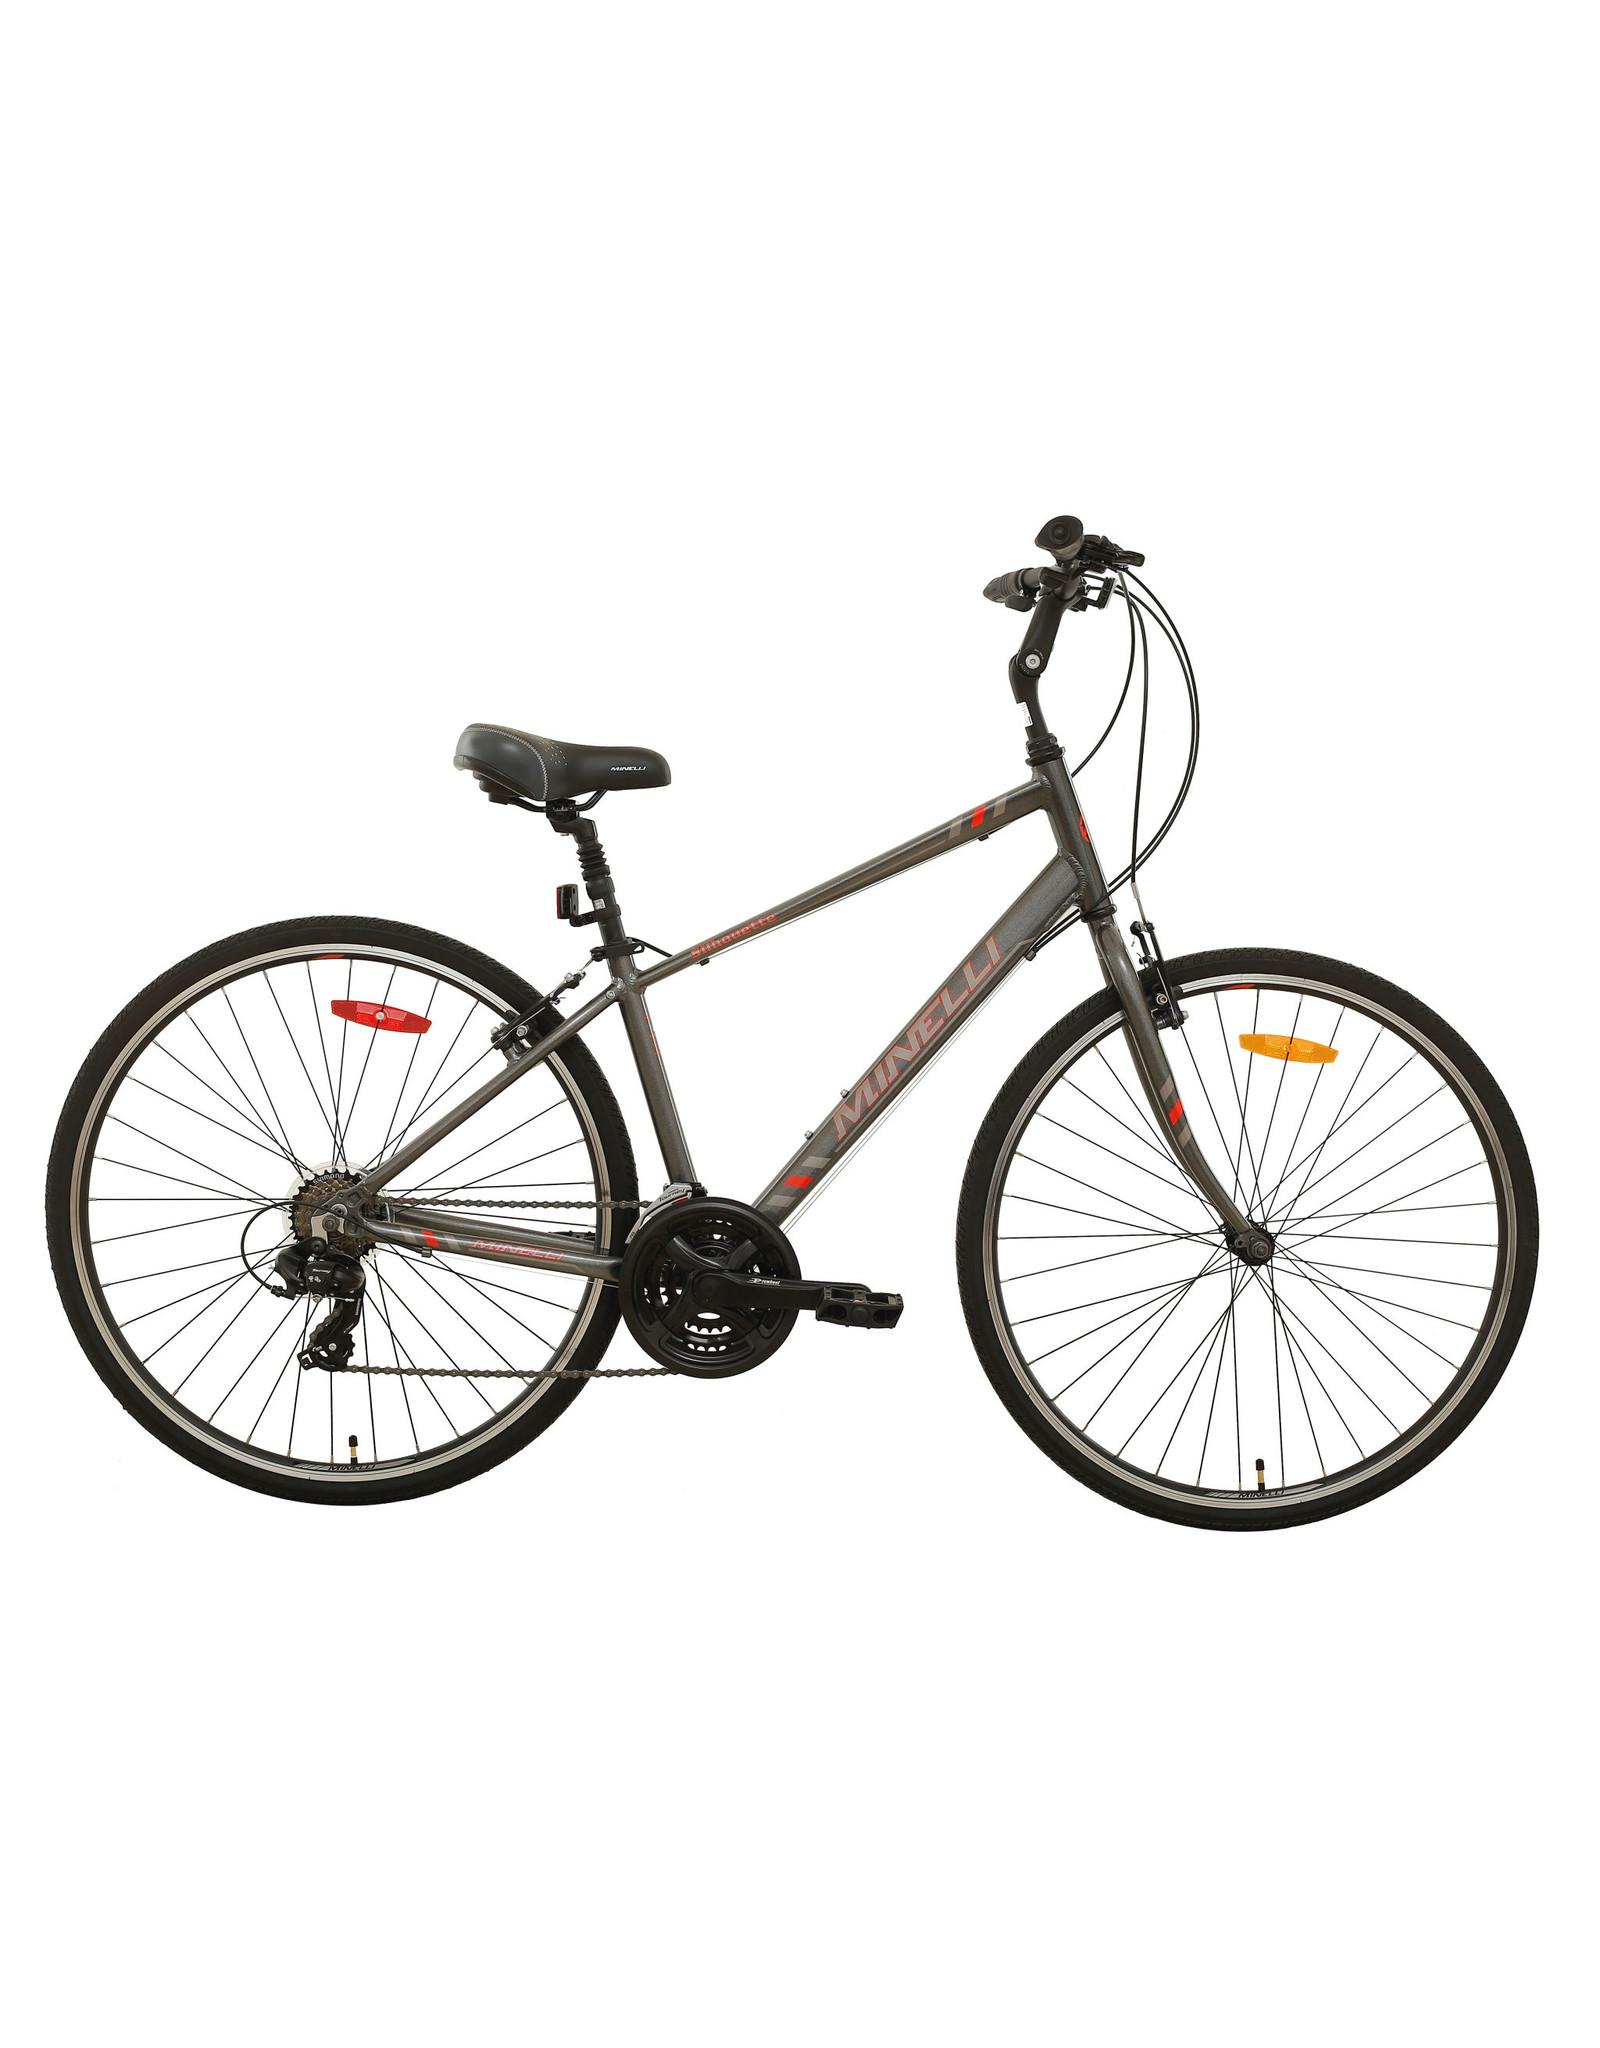 Minelli Hybrid Bike - MINELLI Silhouette Man Black / Silver